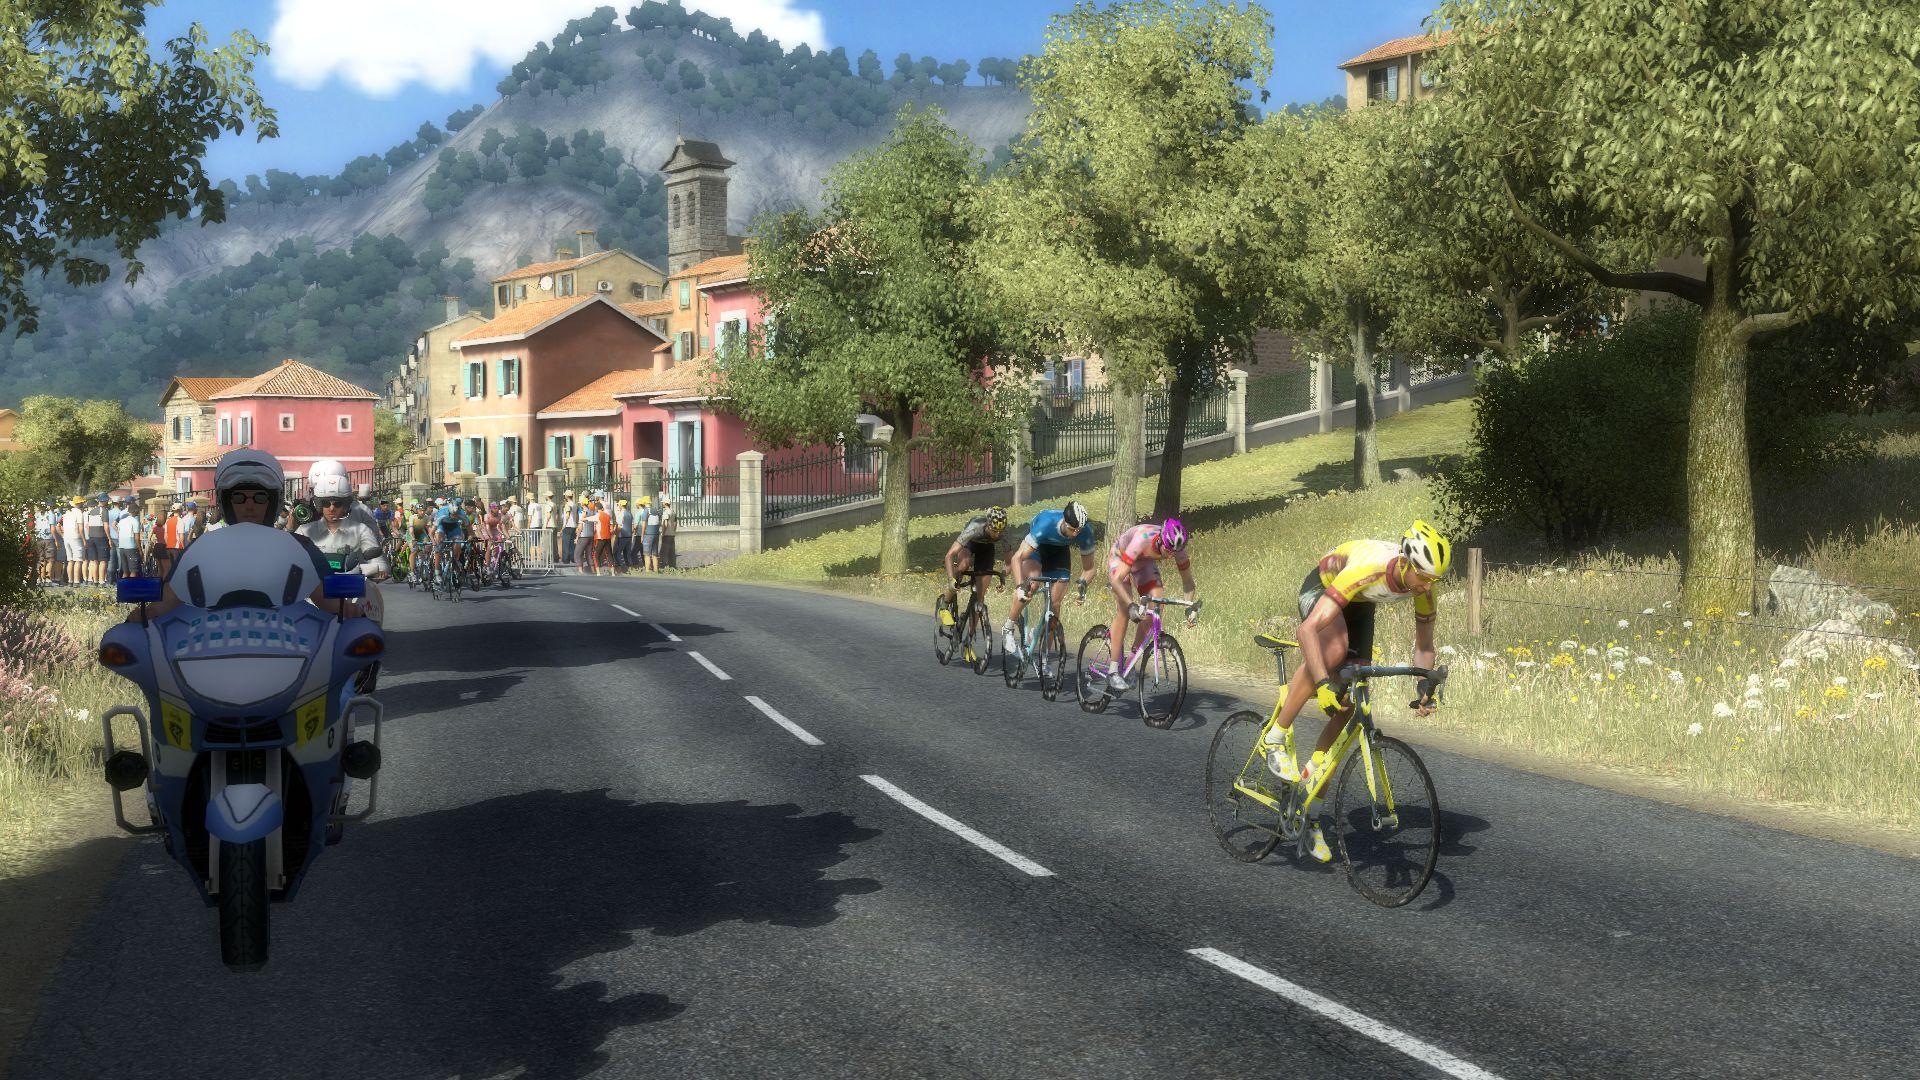 pcmdaily.com/images/mg/2019/Races/PT/Tirreno/mg19_ta_s07_02.jpg